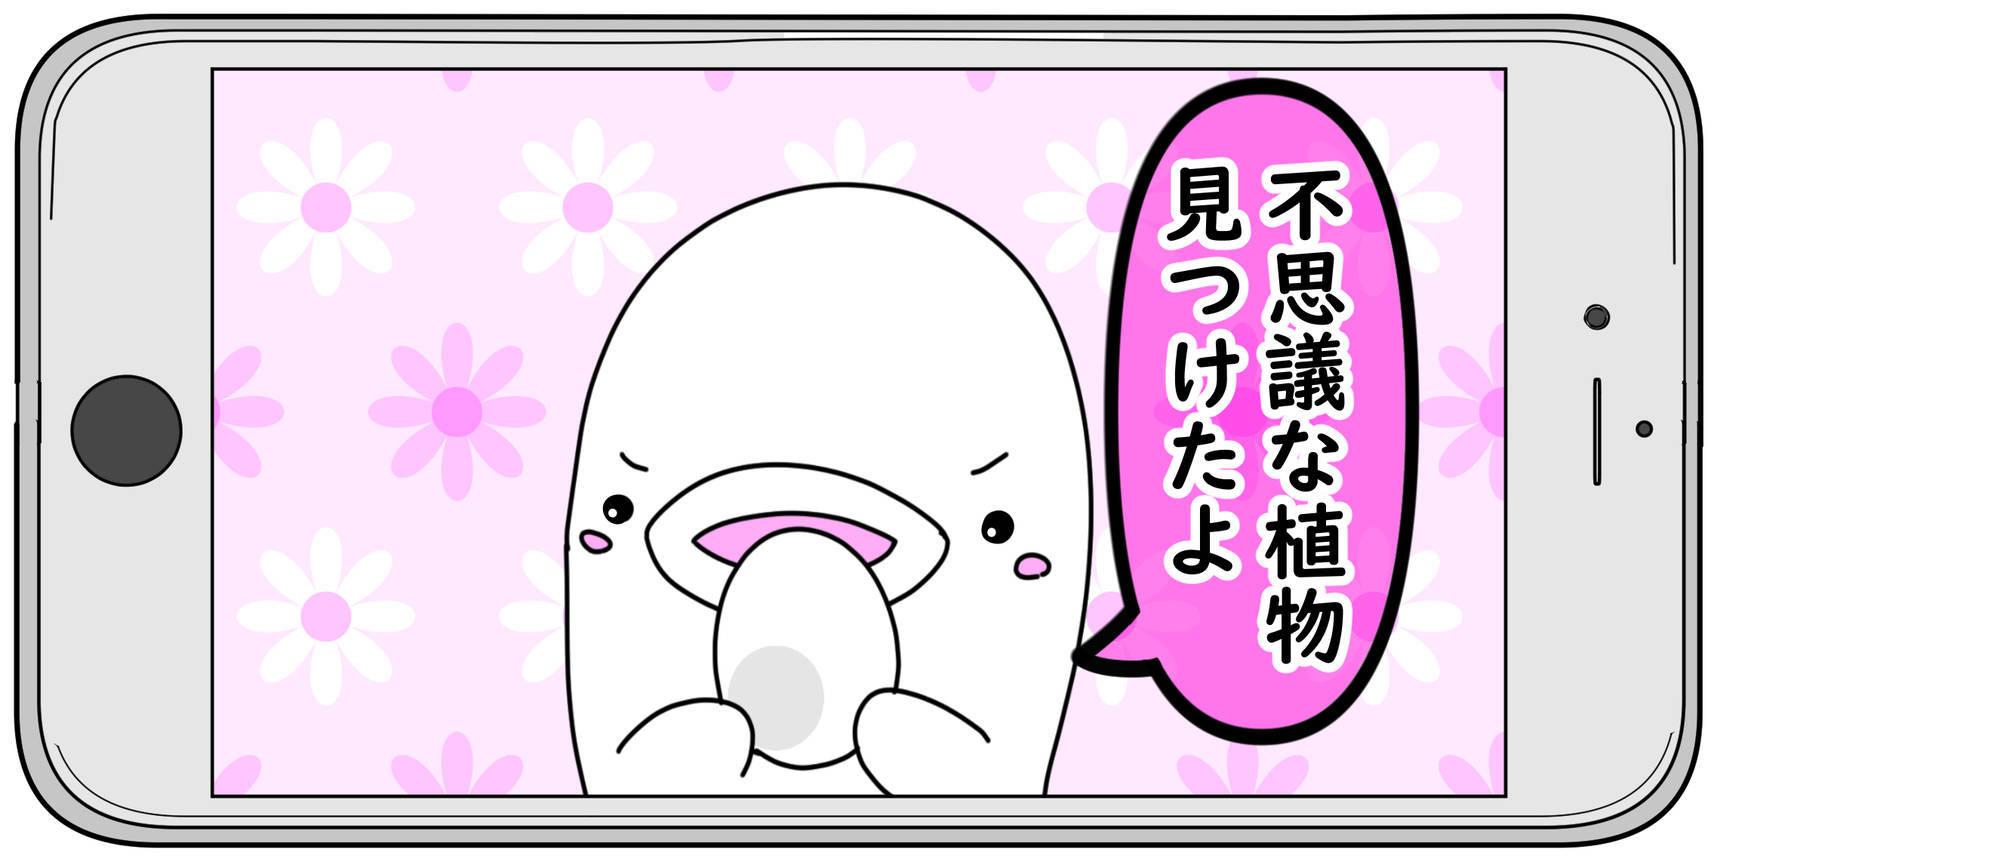 f:id:shiro_iruka:20190520221223j:plain